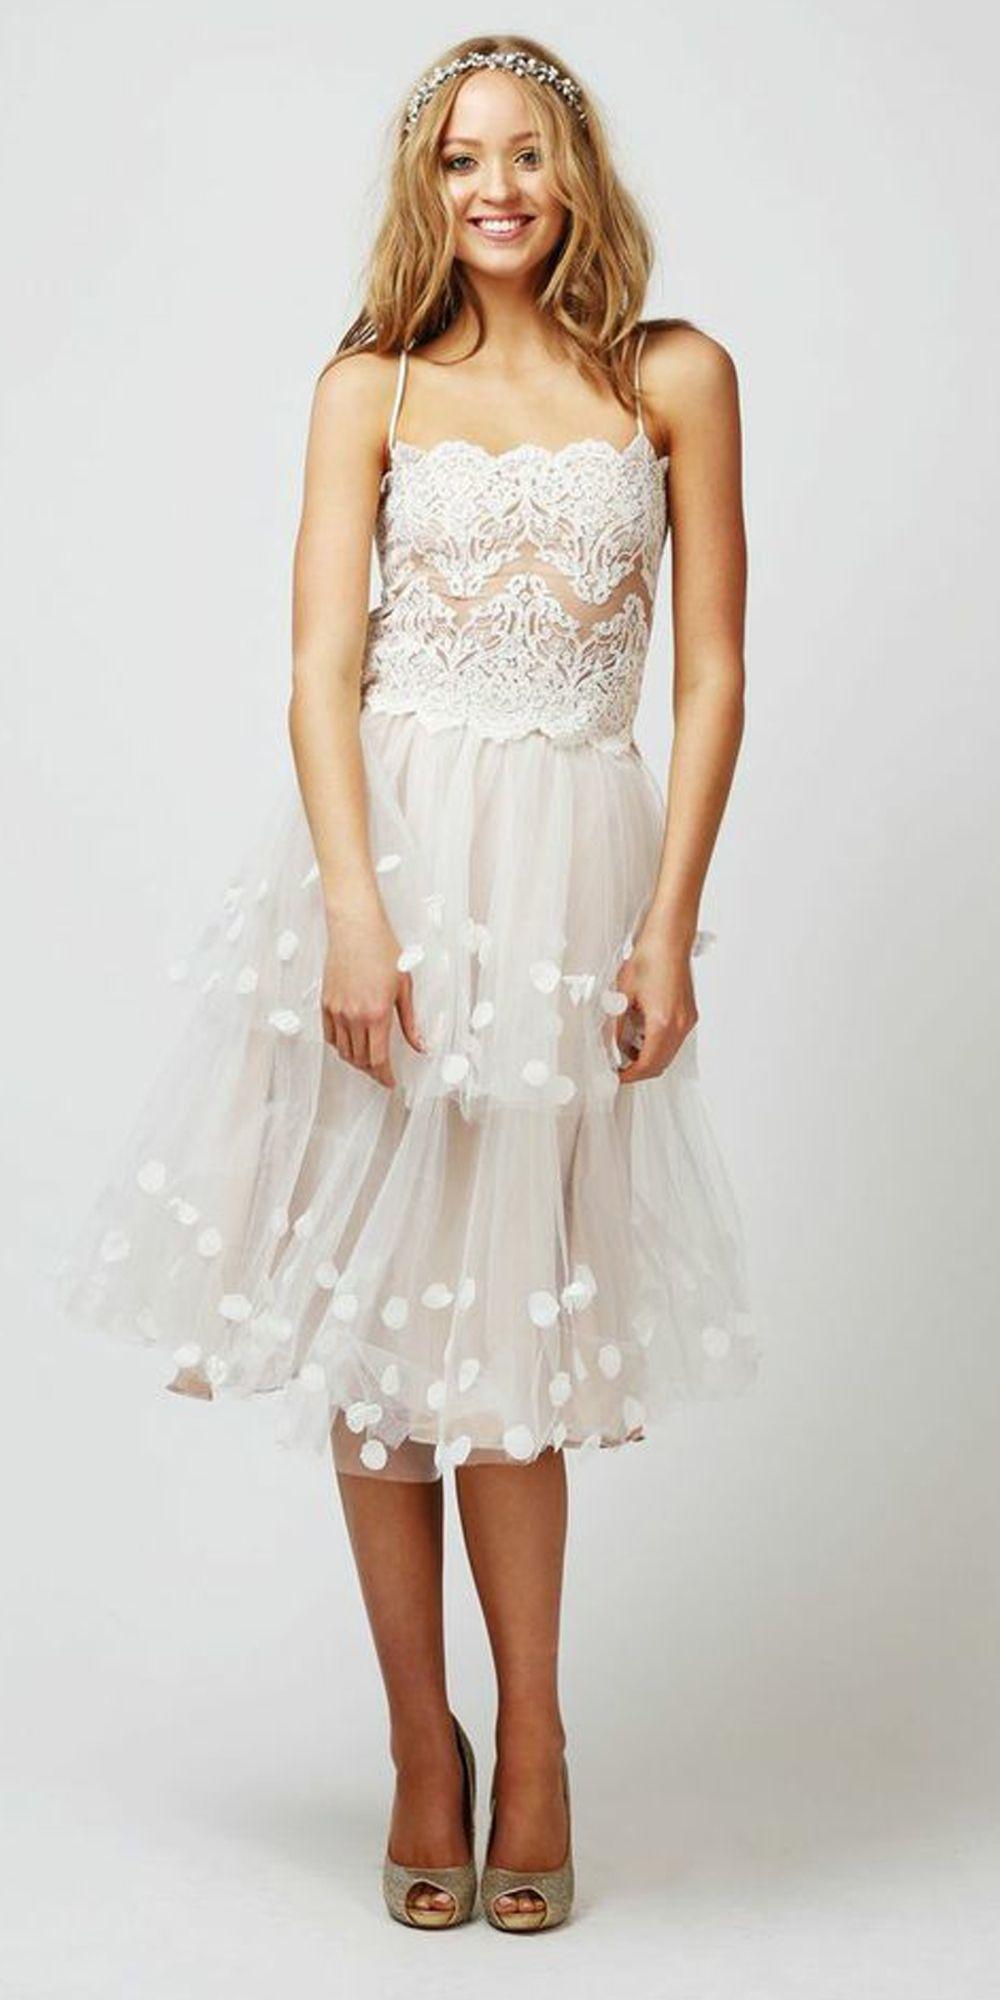 caudpetal Wedding dresses brisbane, Wedding dresses